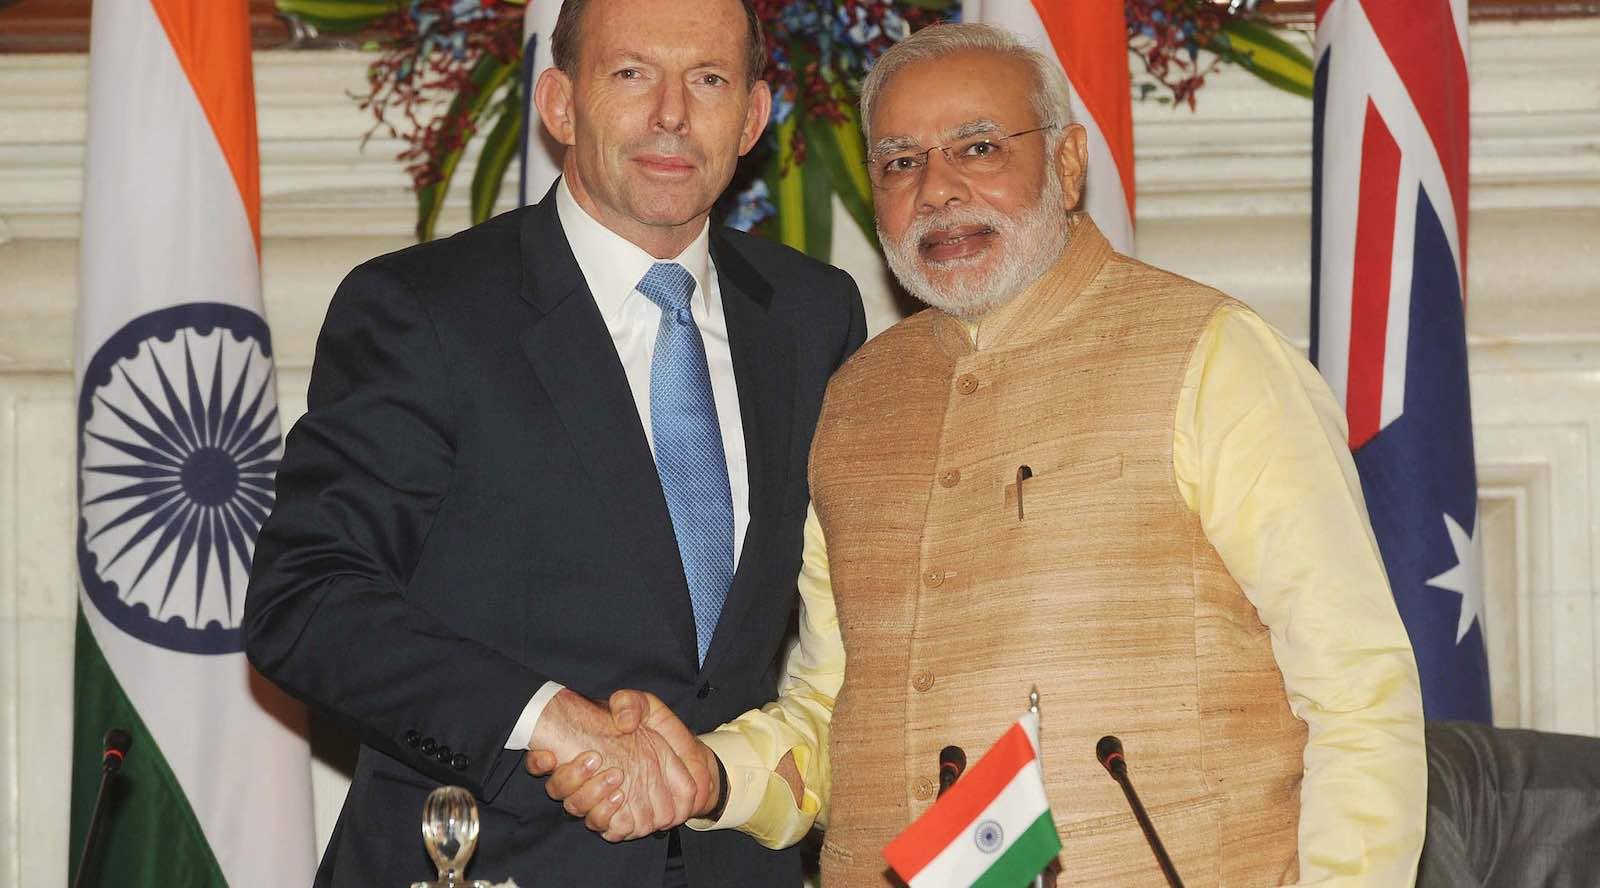 Then Australian prime minister Tony Abbott with India's Narendra Modi in 2014 (Photo: Narendra Modi/Flickr)